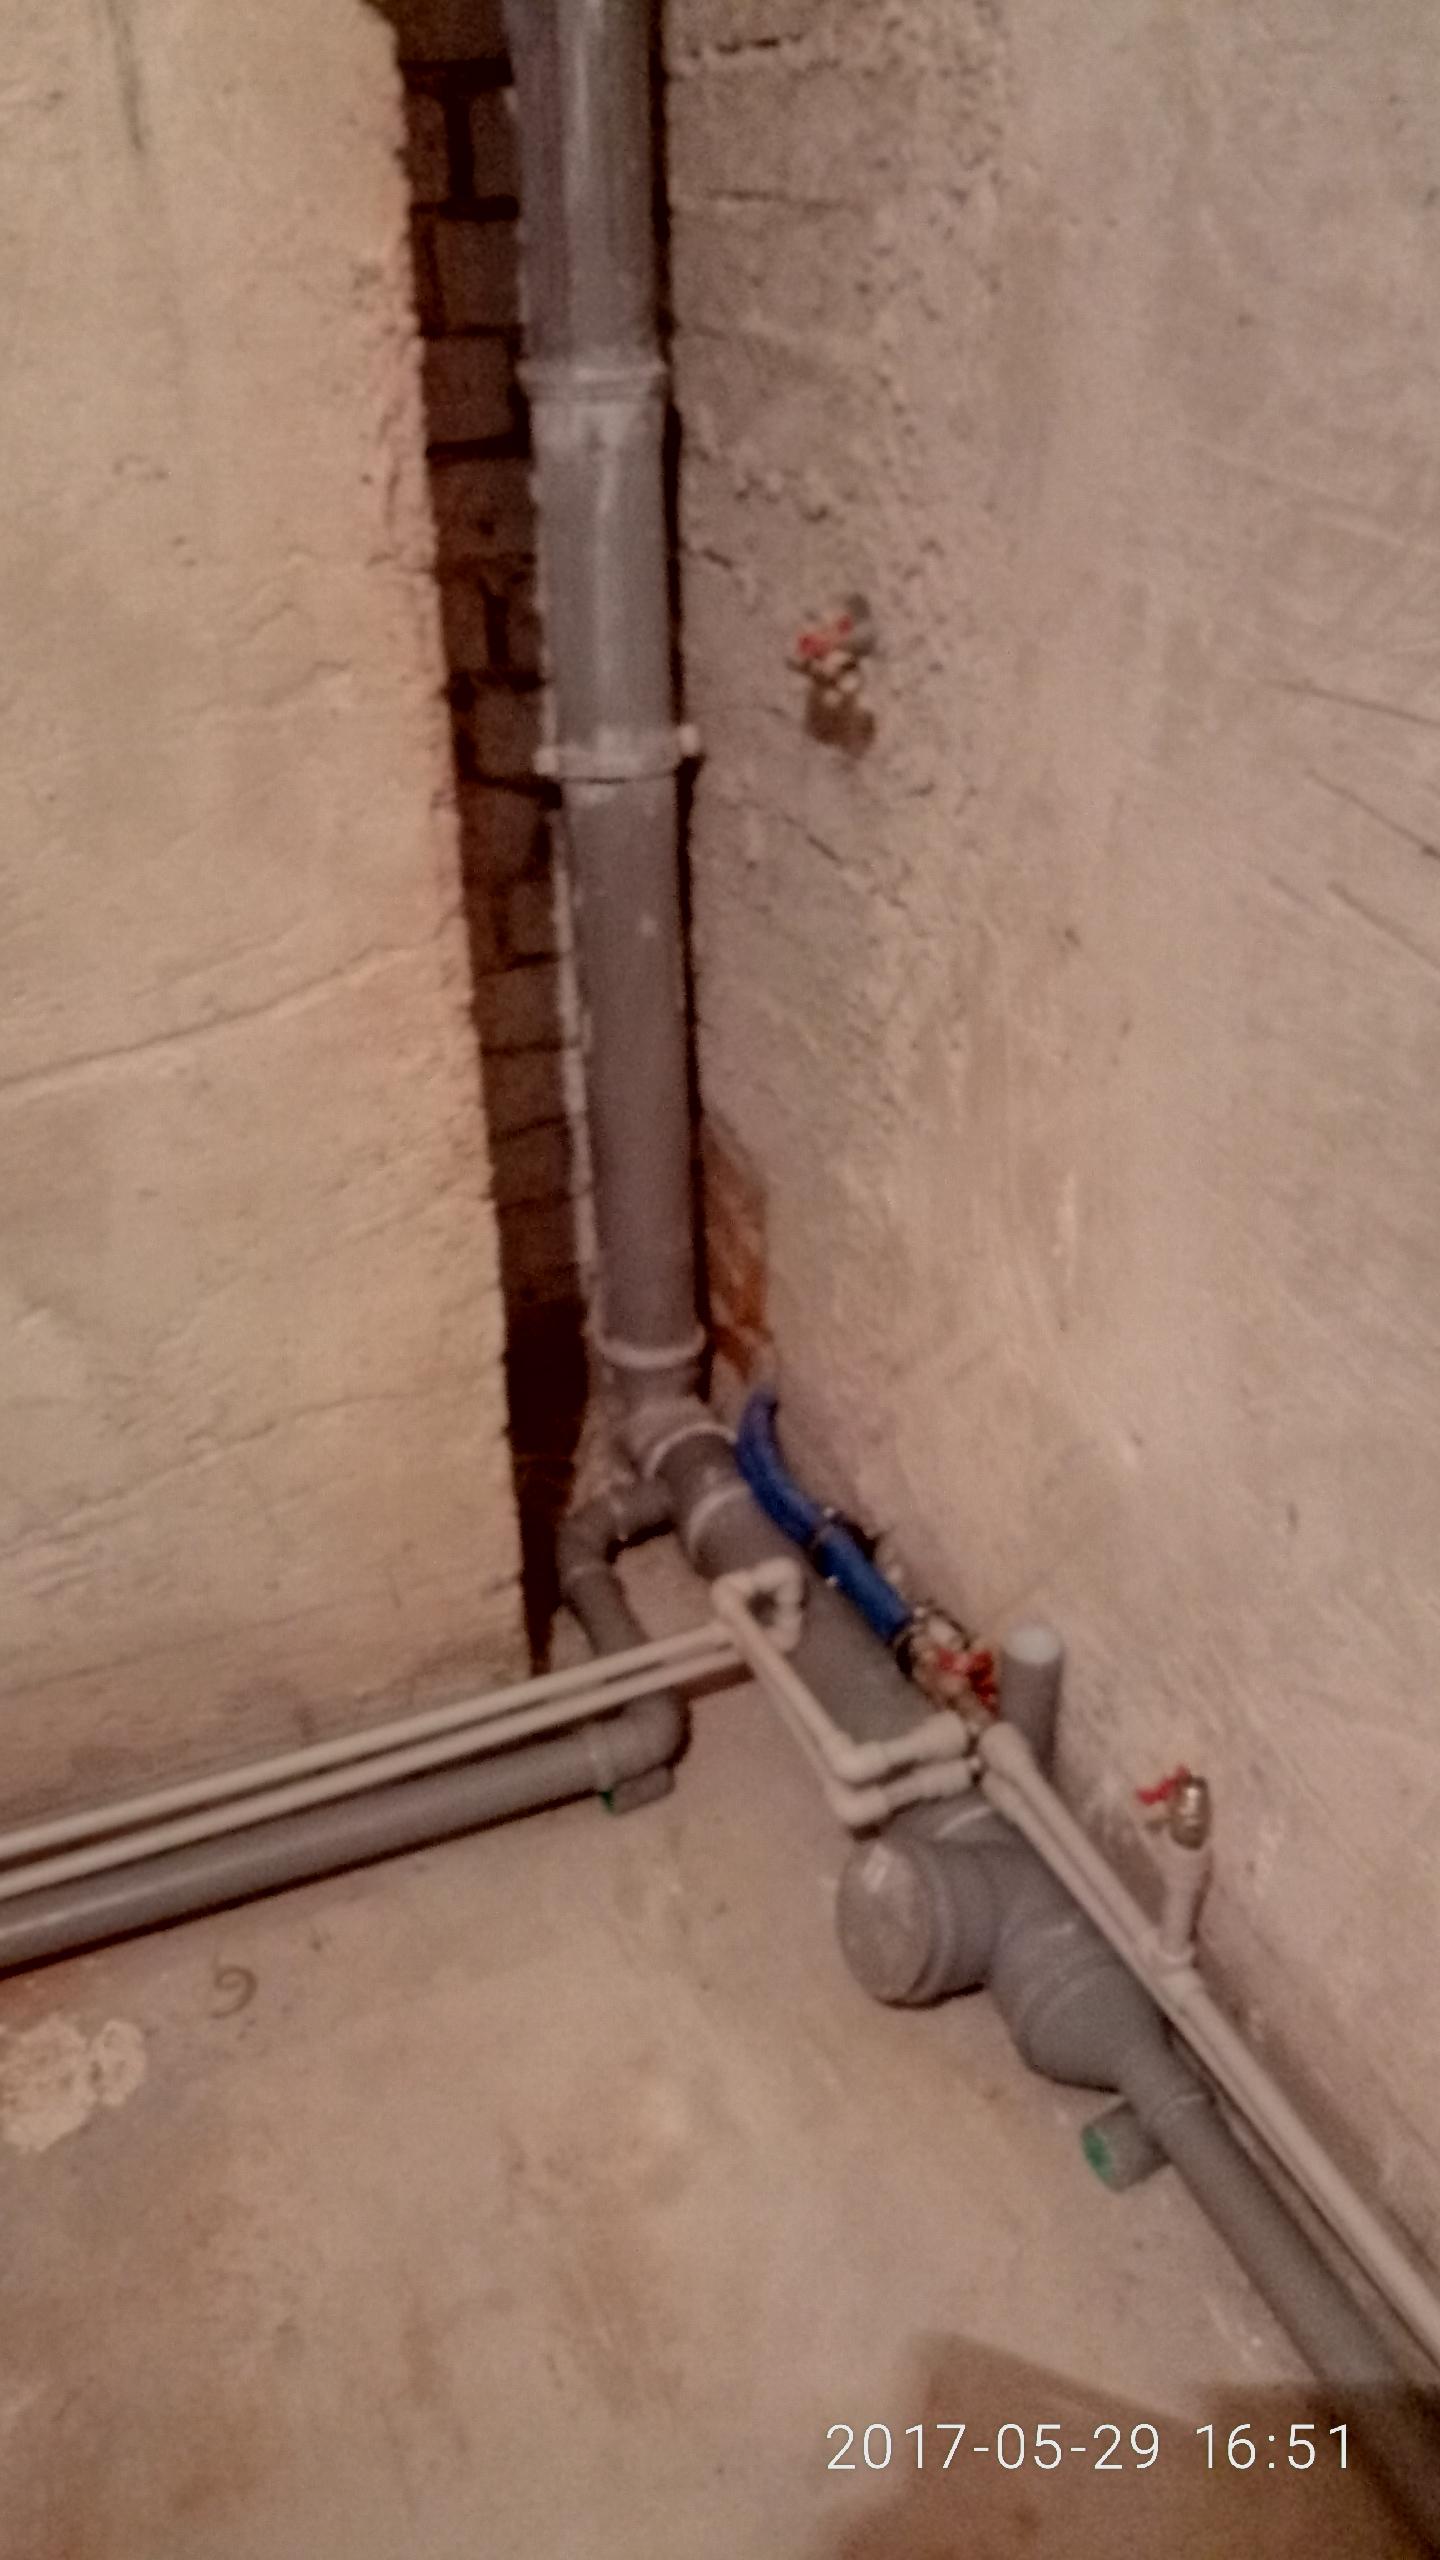 Фото монтаж канализацыи монтаж трубопровода полипропиленом